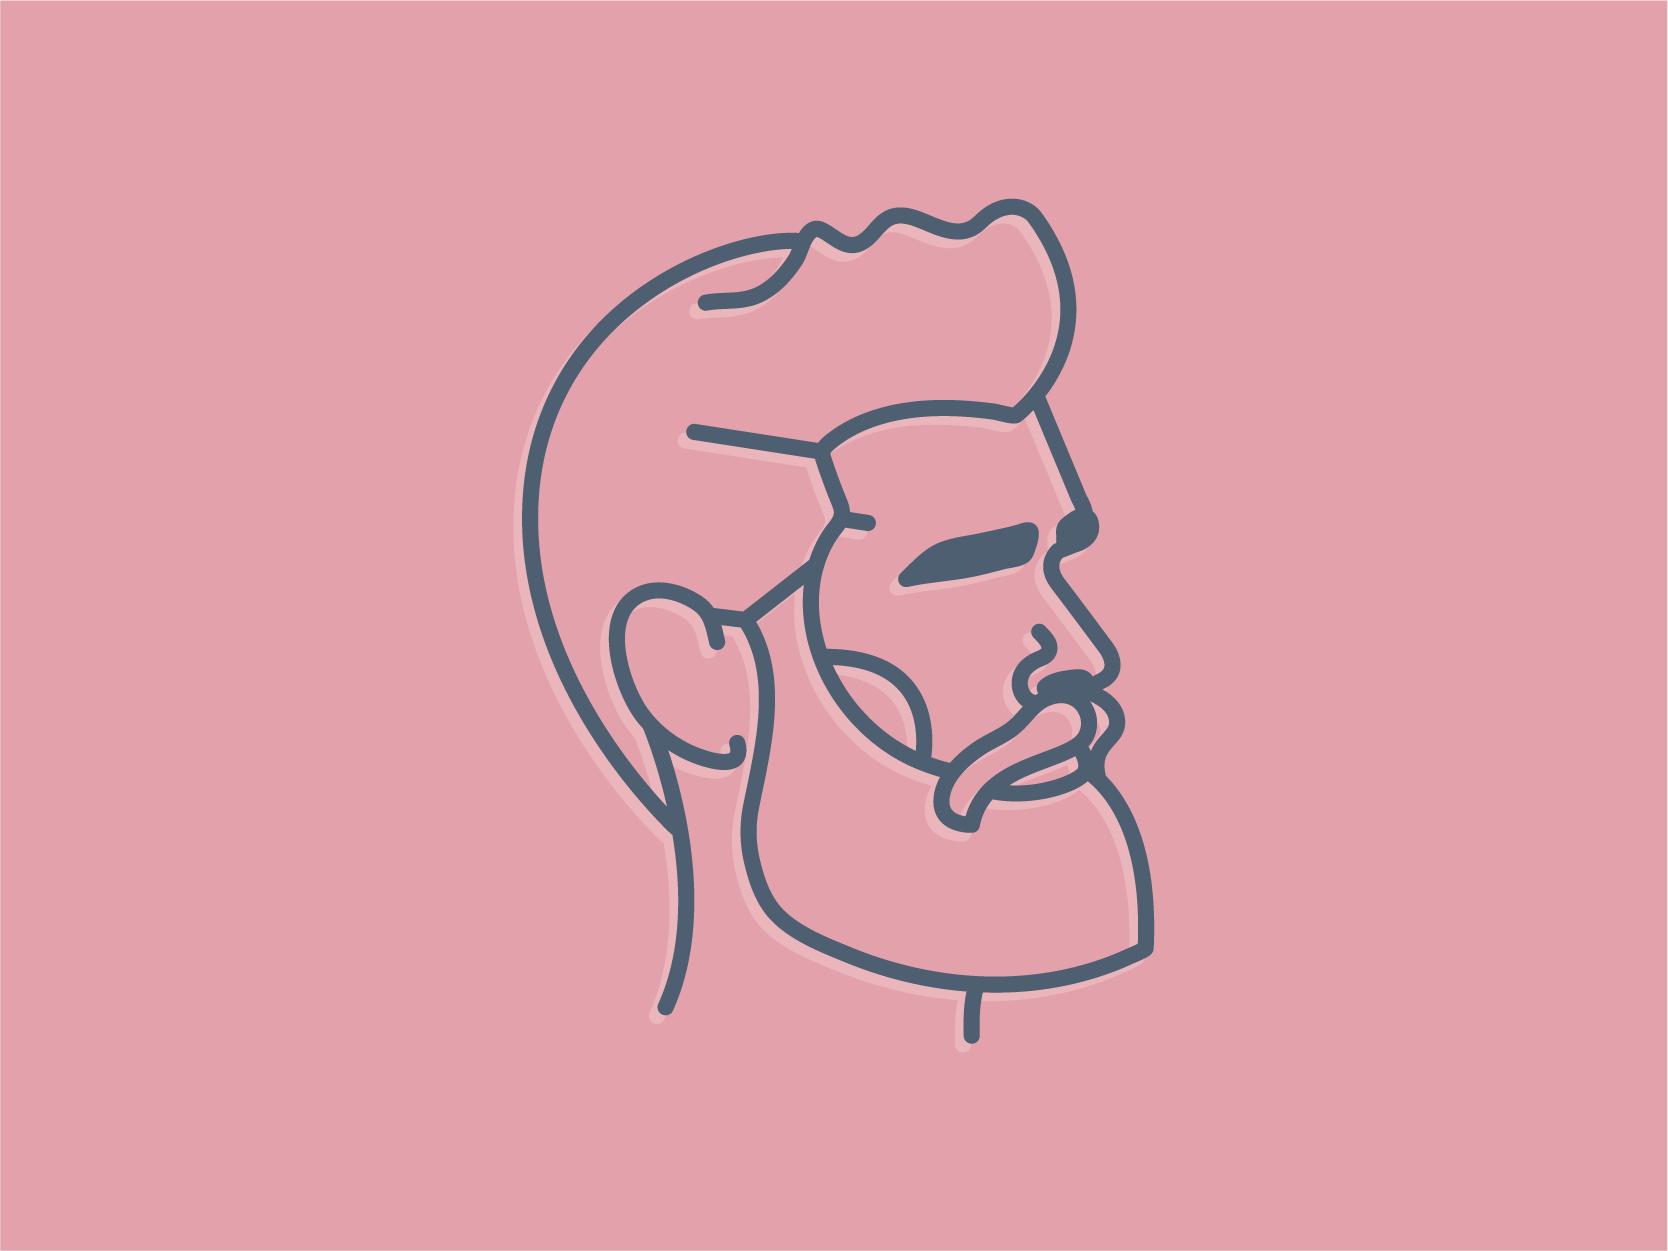 Barbershop logo 13